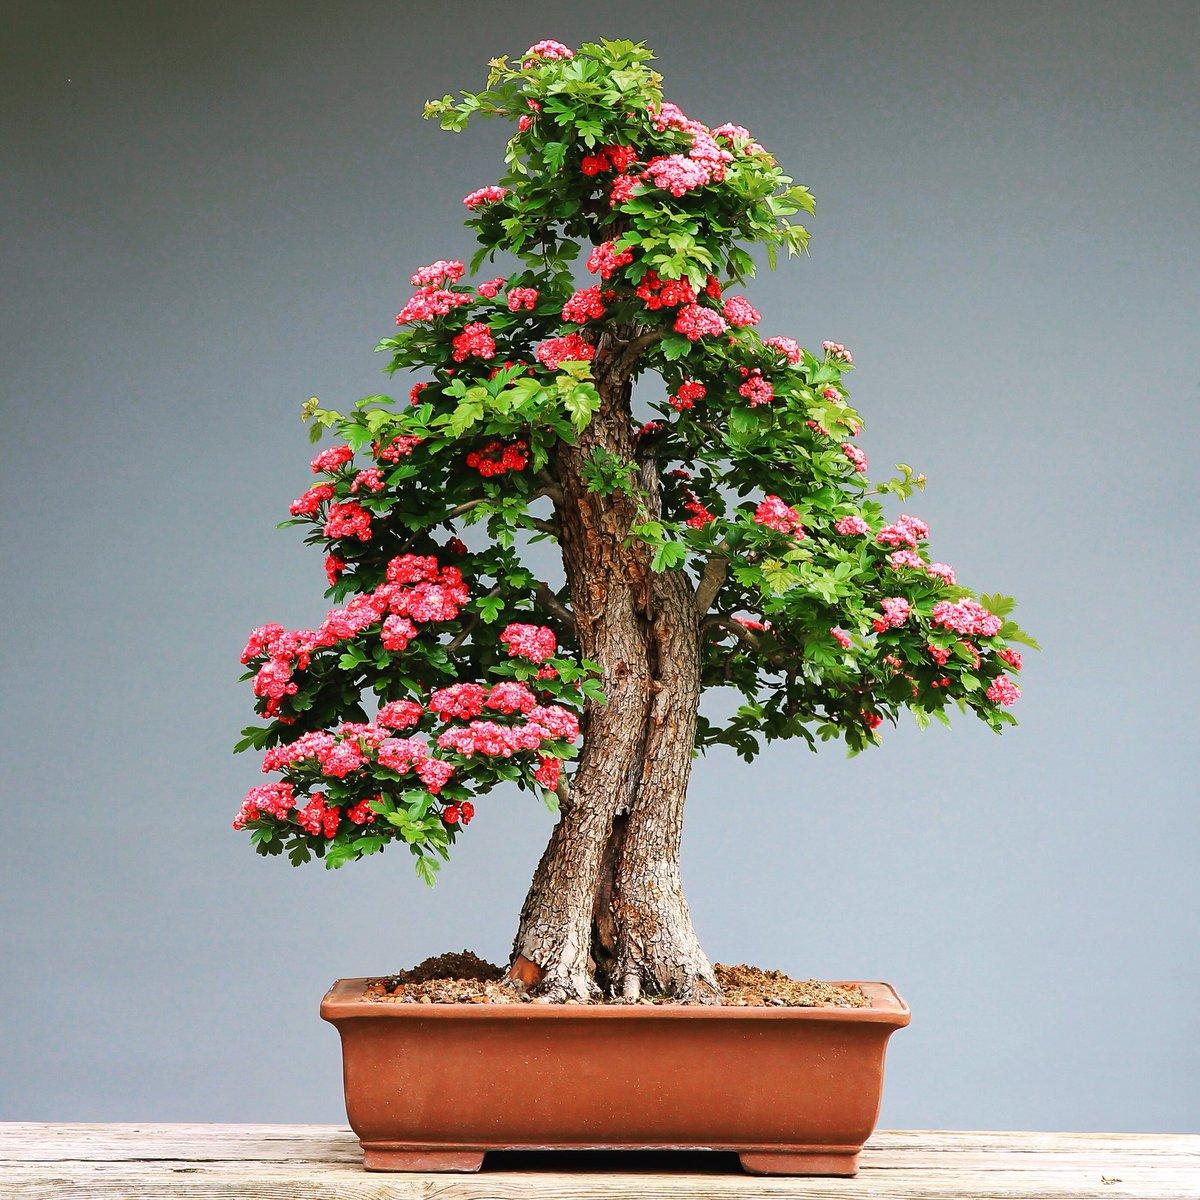 Bonsai Takumi On Twitter Green Tree With Pink Flower Bonsai